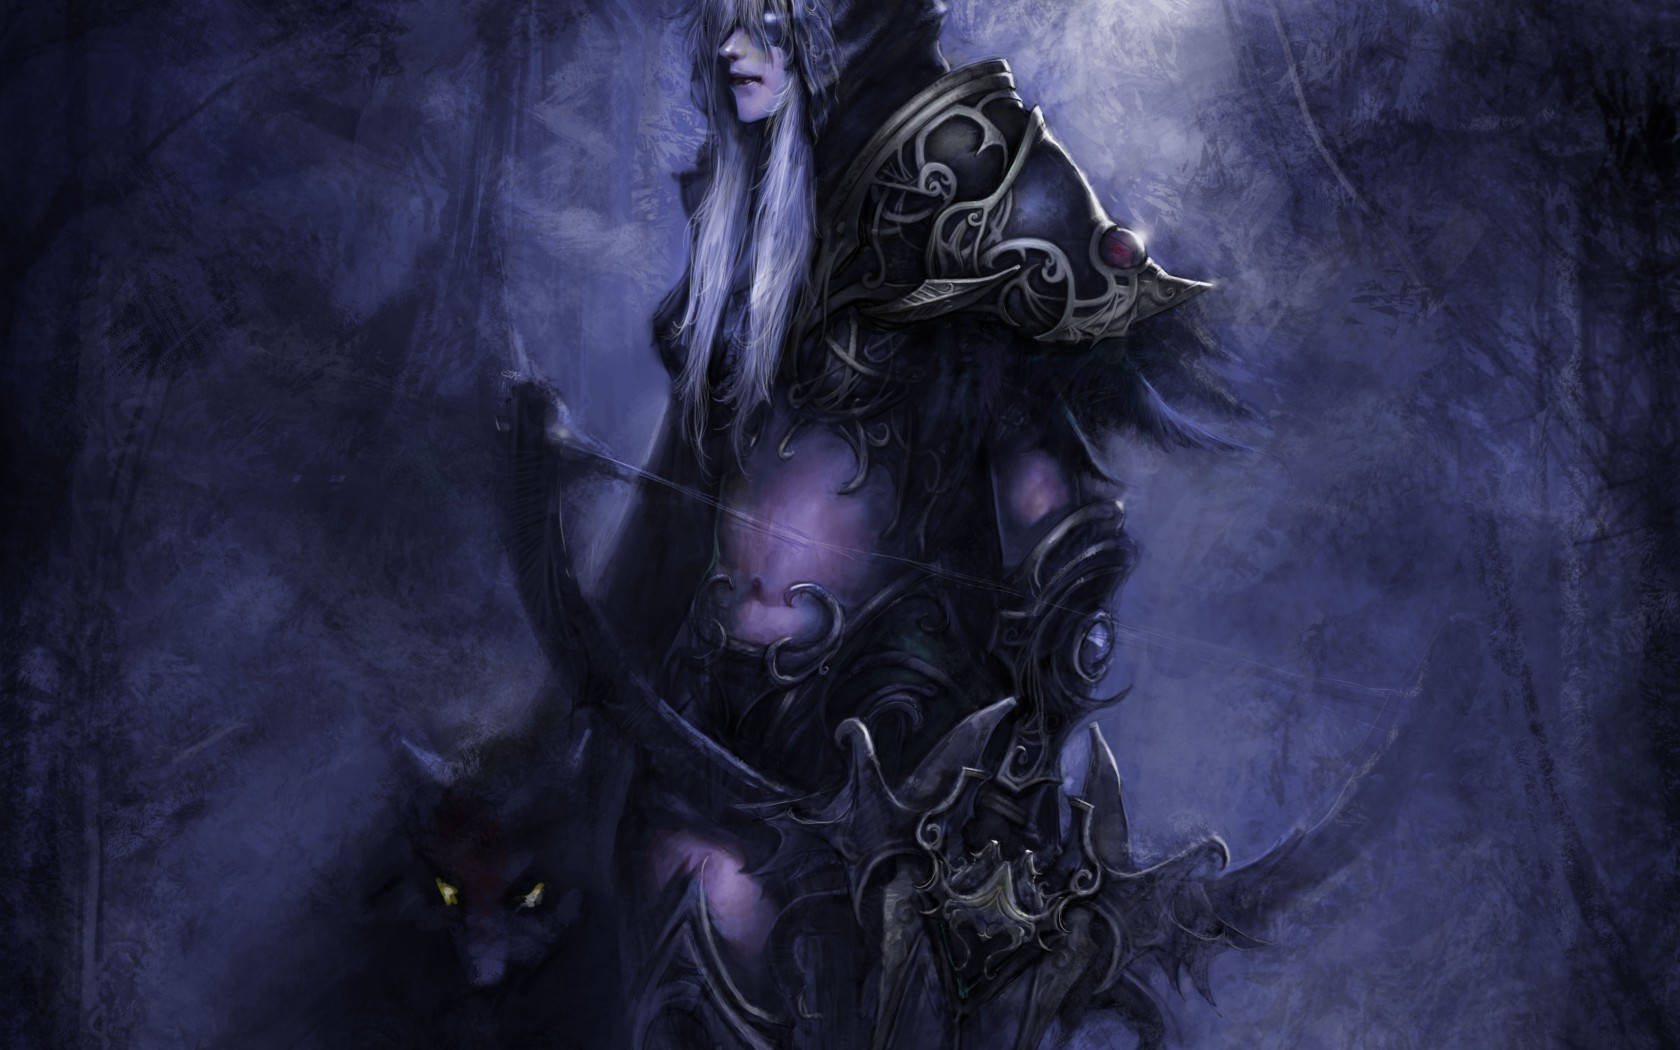 video games World of Warcraft Sylvanas Windrunner 1680x1050